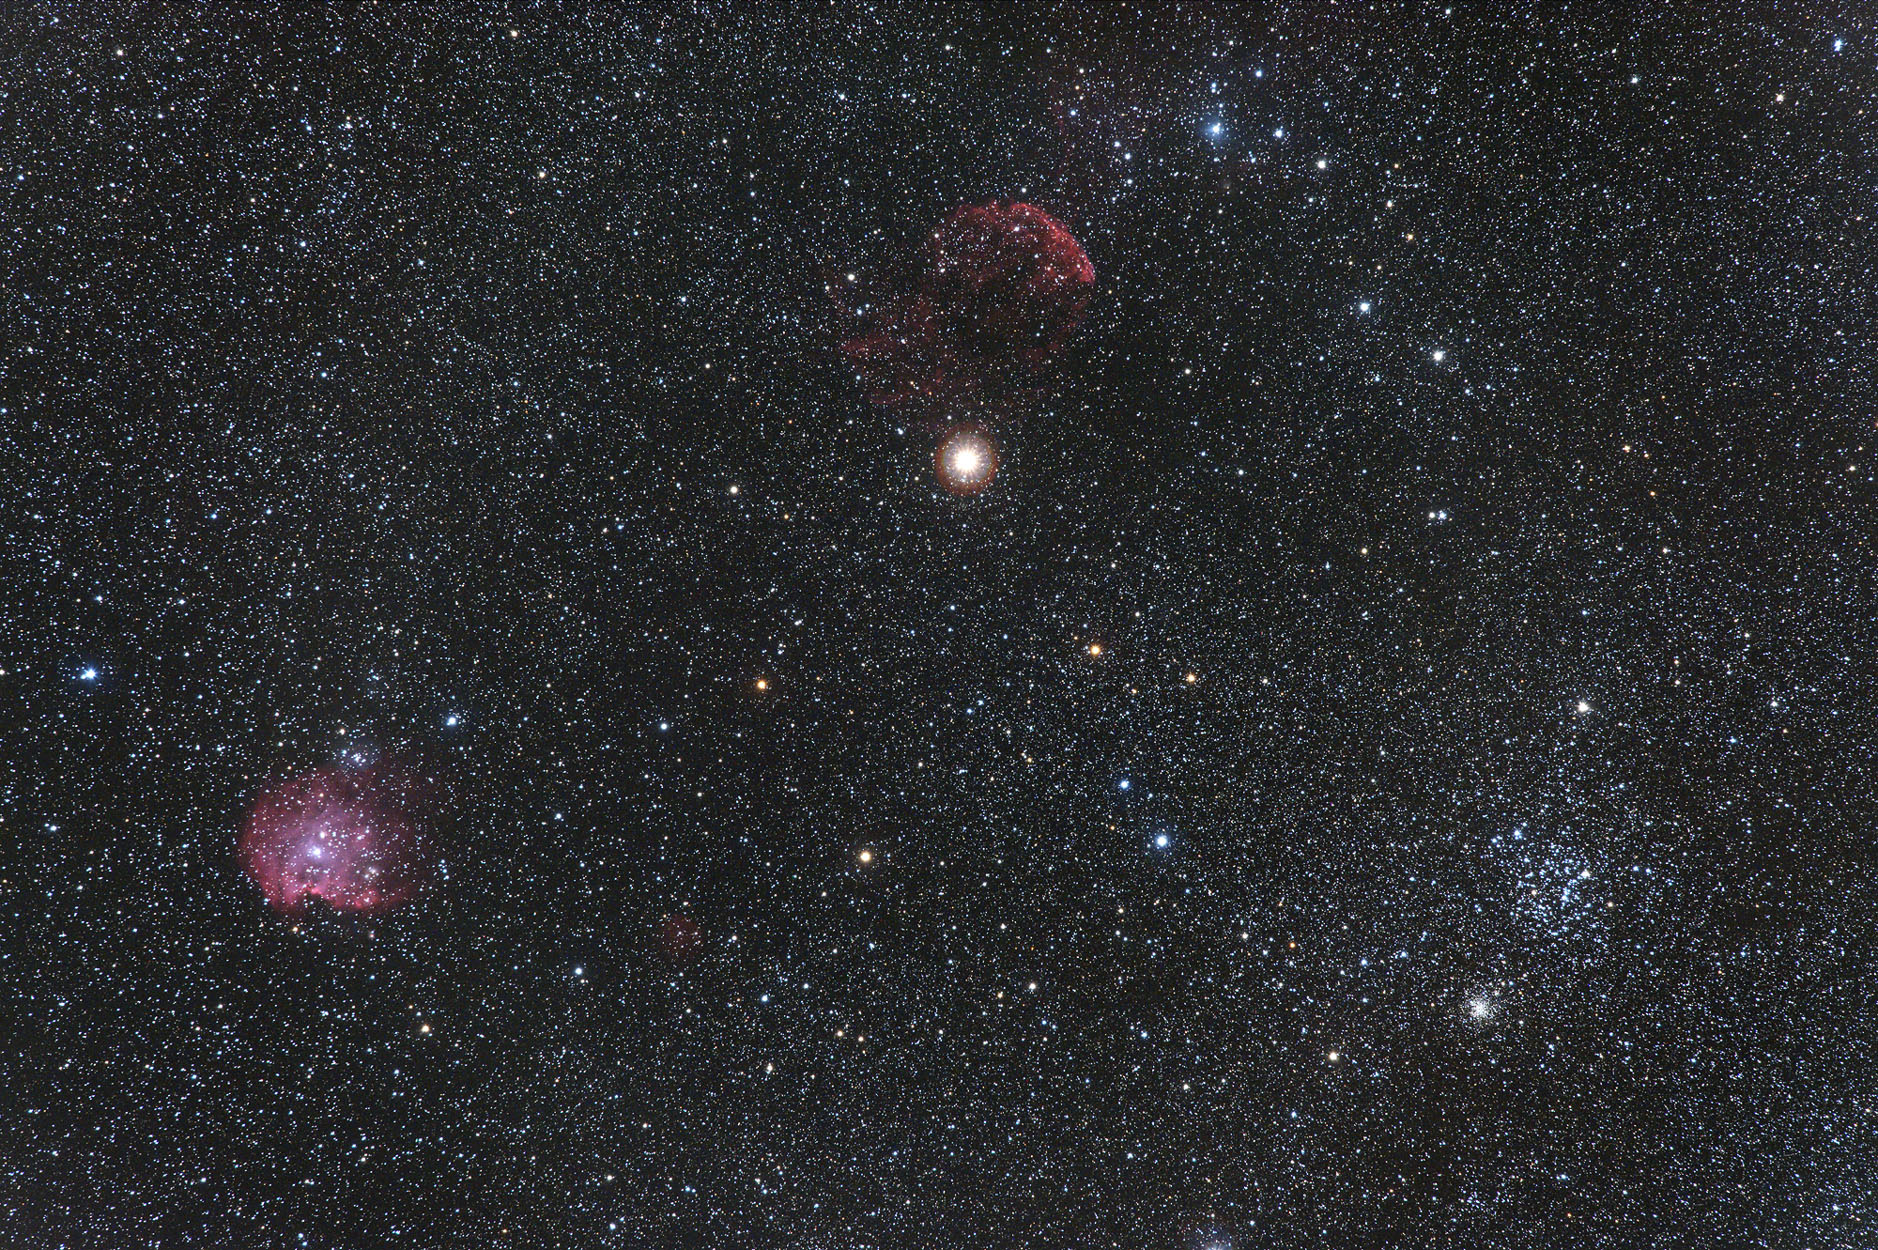 M35-201902-PSmAS.jpg.b0a6a175b026bf9b32e4c10d26956c3a.jpg